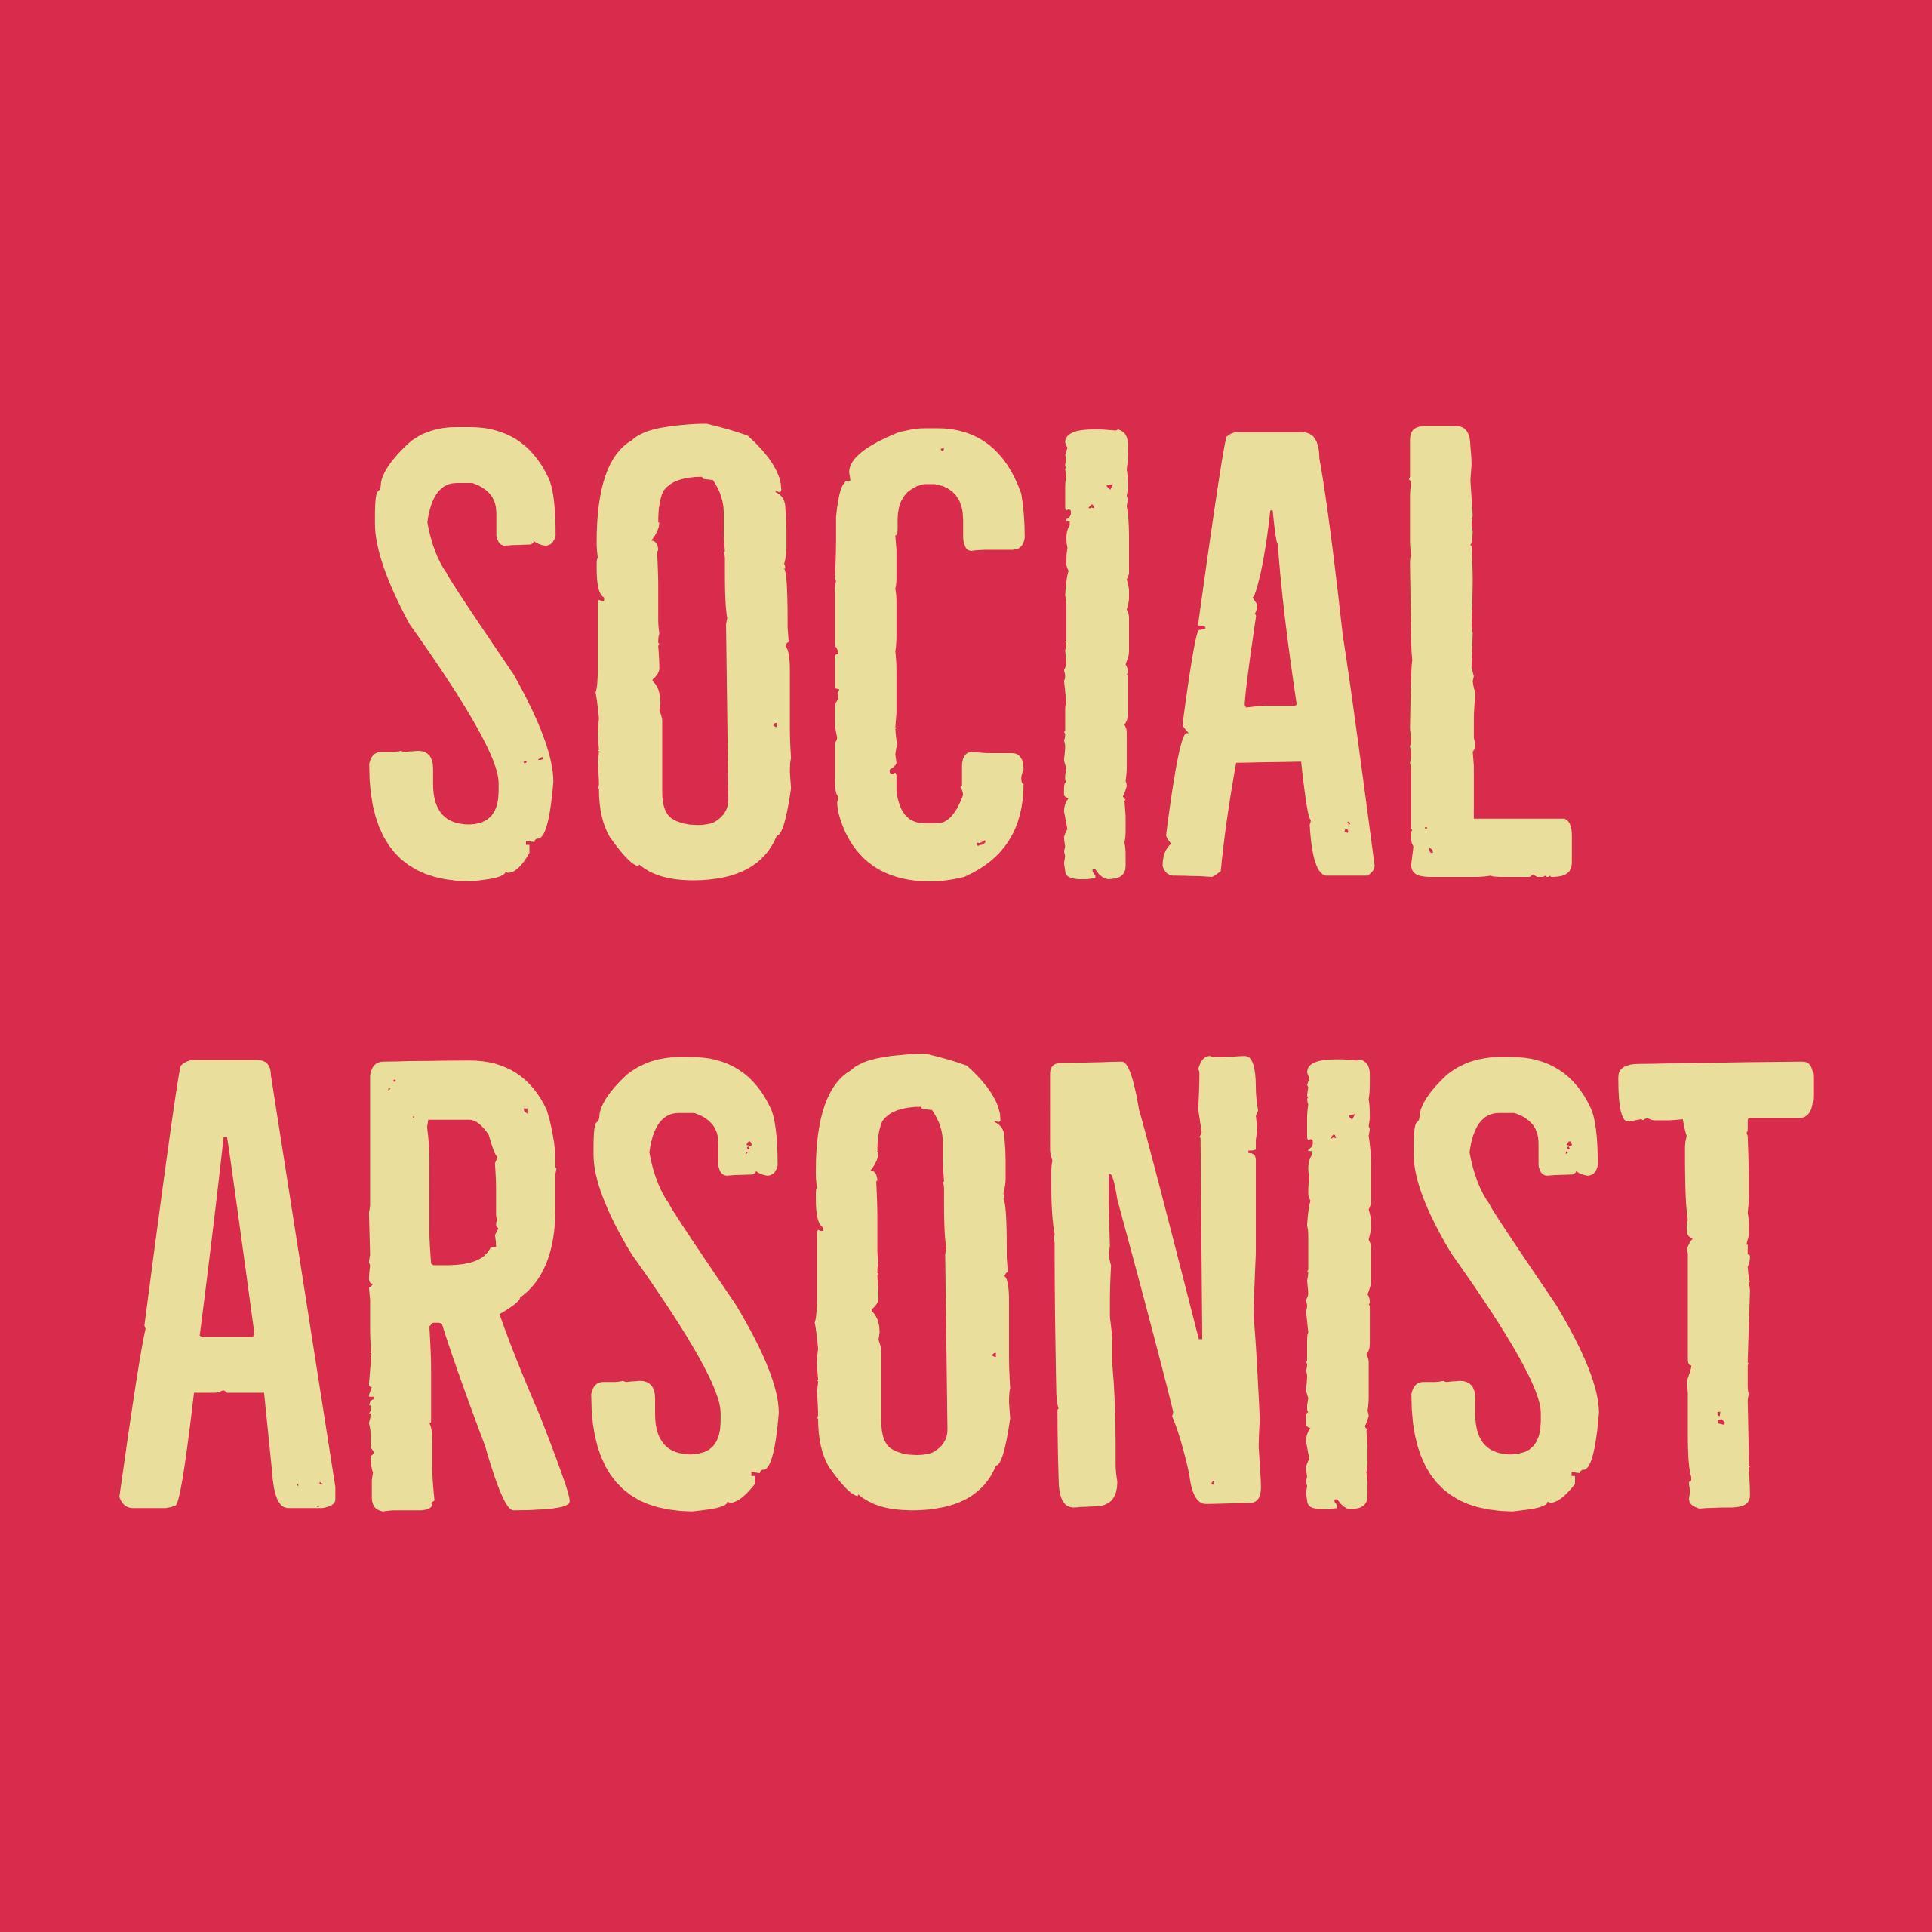 Social Arsonist